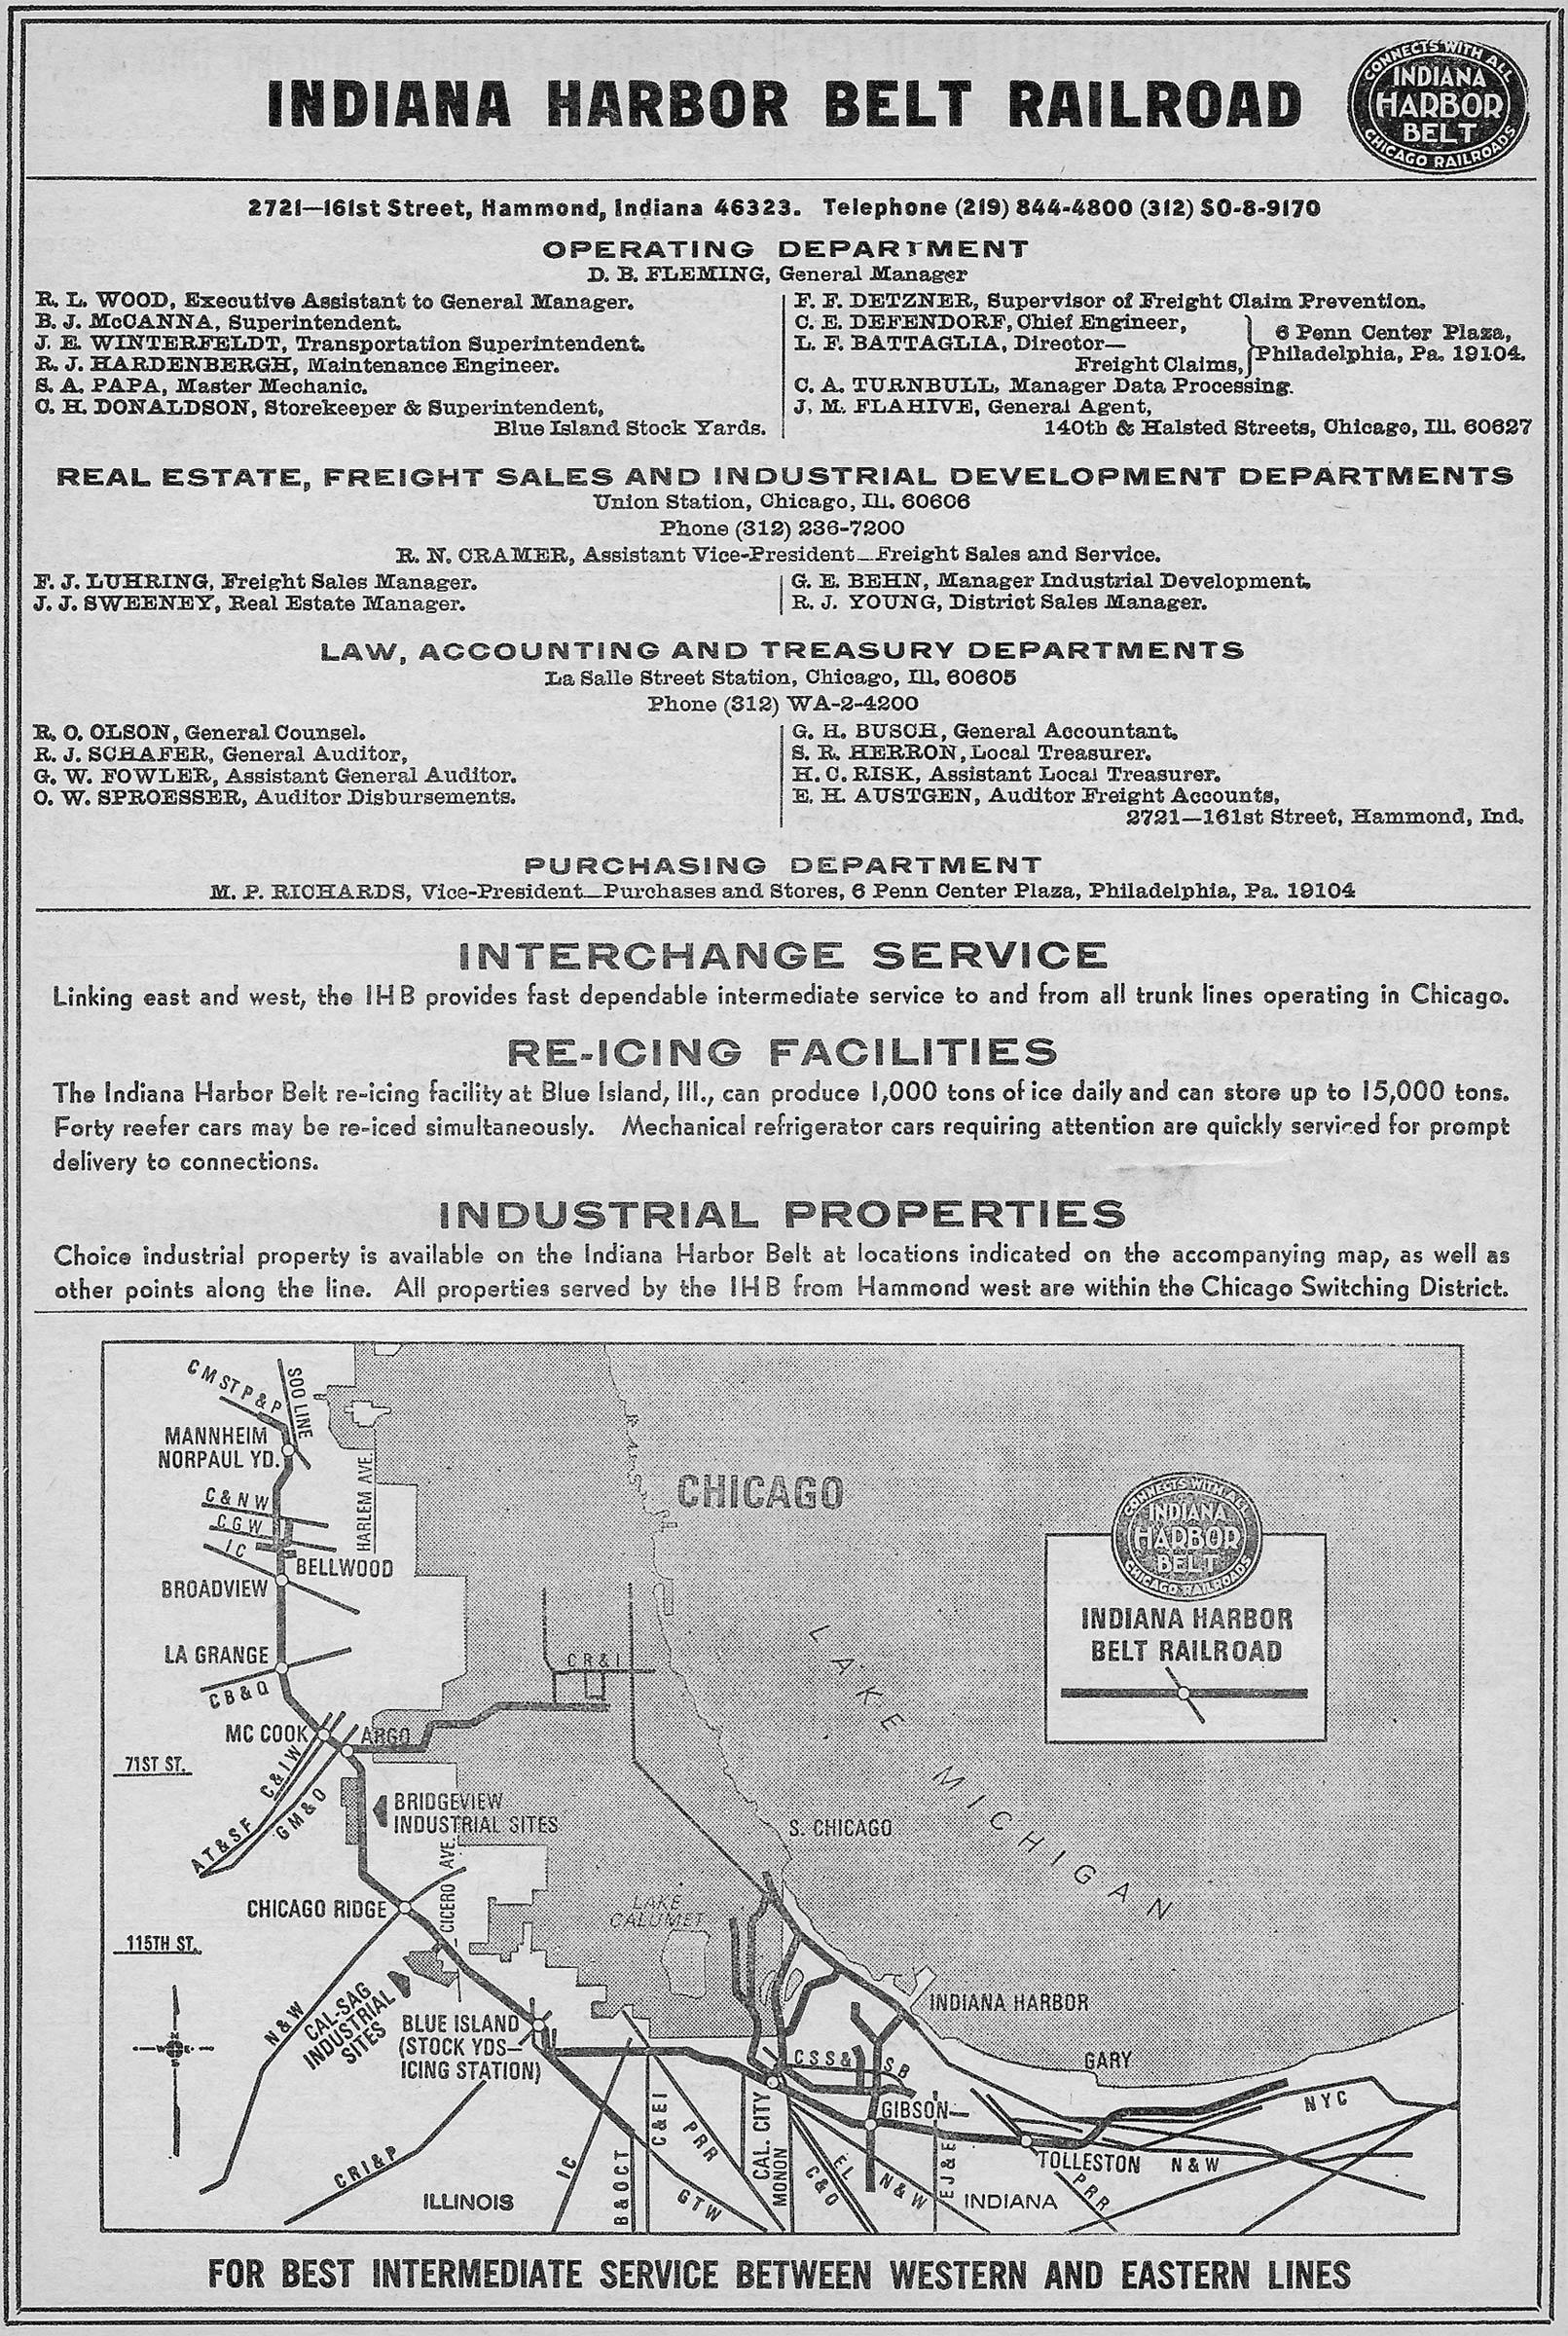 The Indiana Harbor Belt Railroad